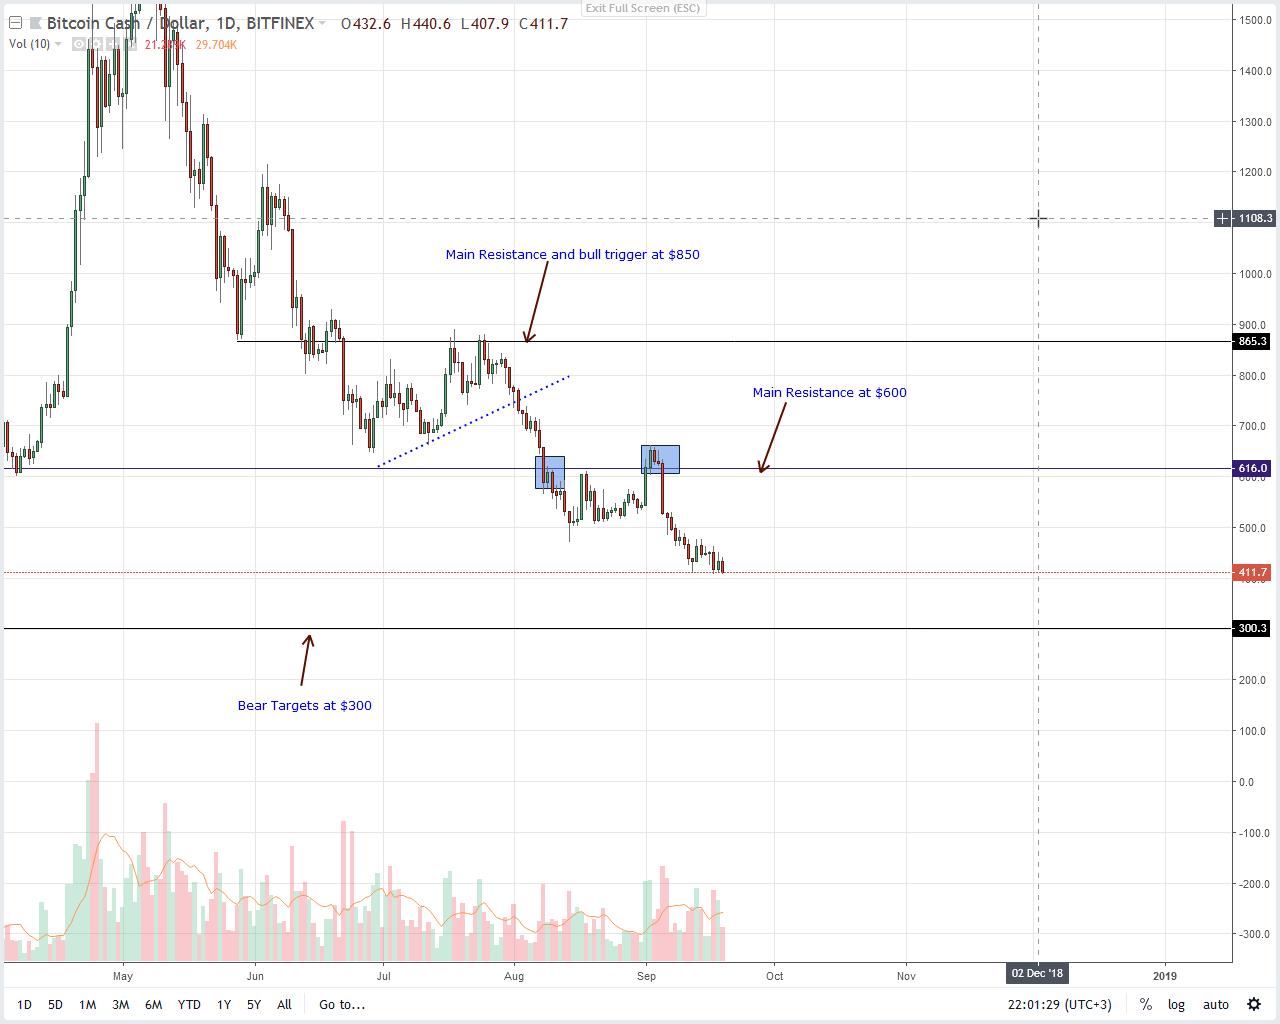 Bitcoin Cash Price Analysis